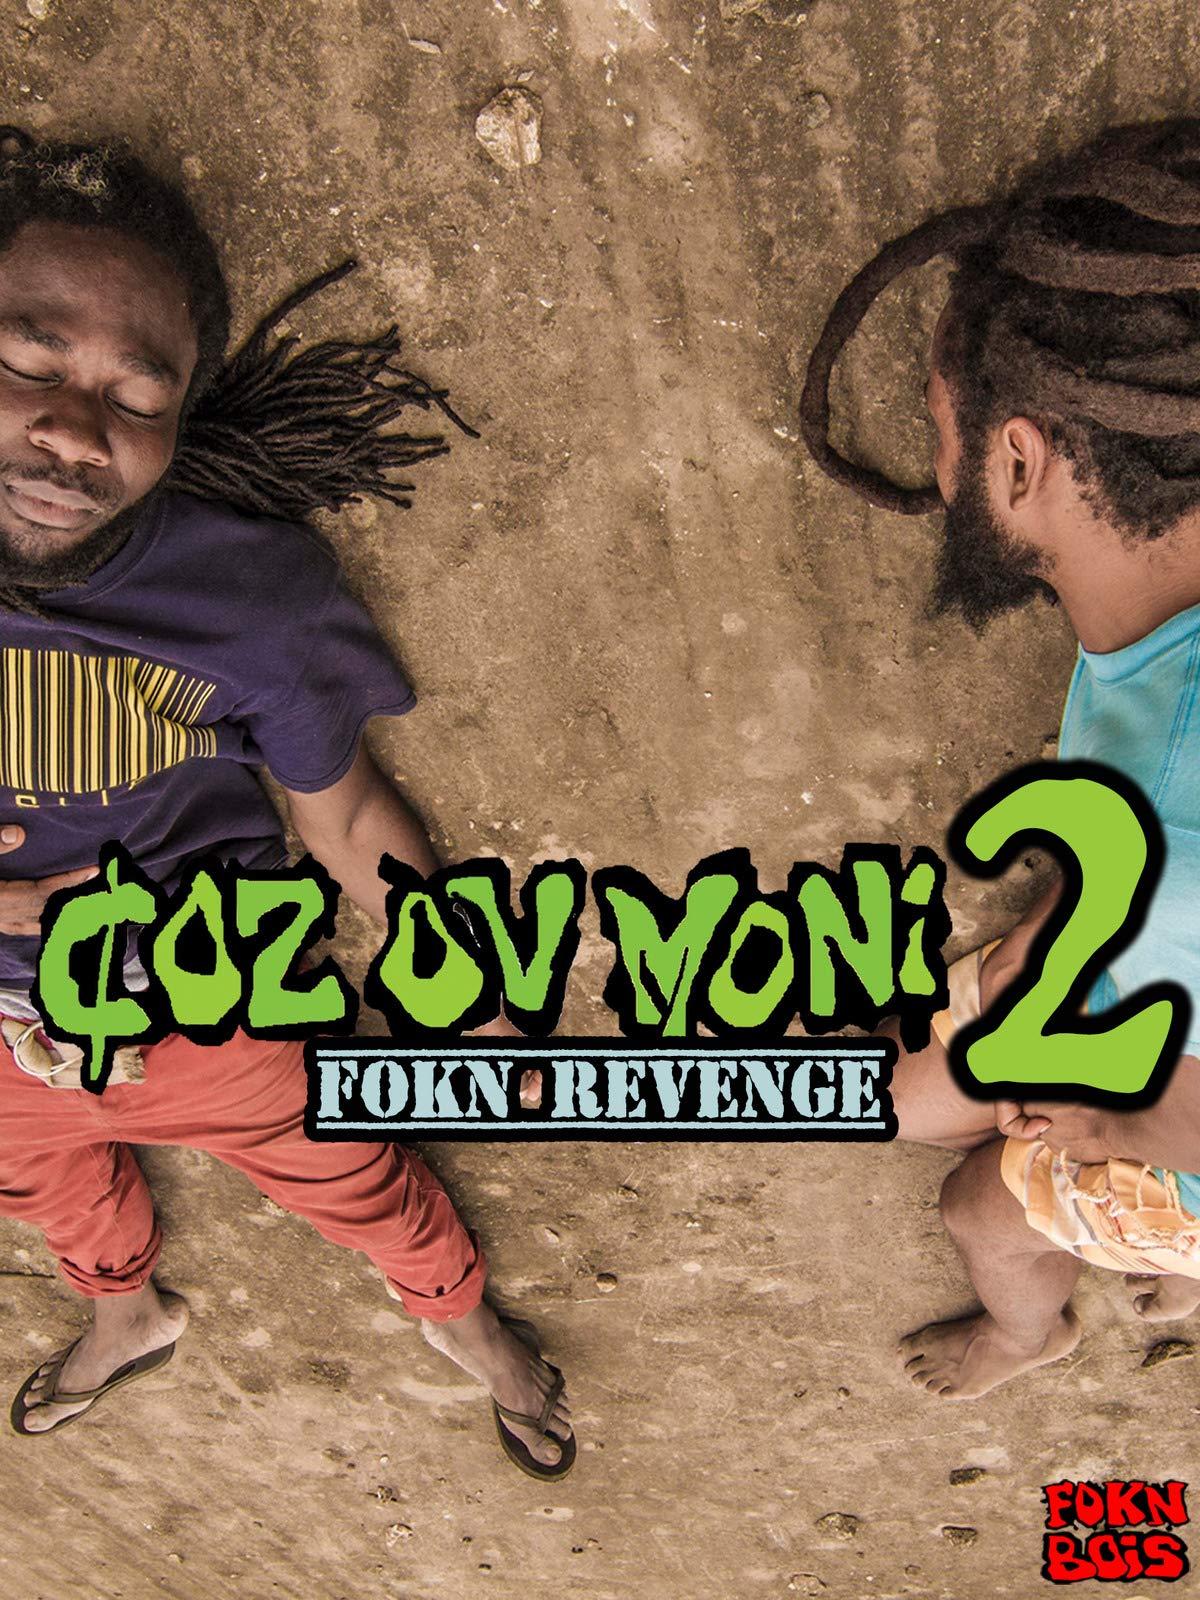 Coz Ov Moni 2 - FOKN Revenge on Amazon Prime Video UK